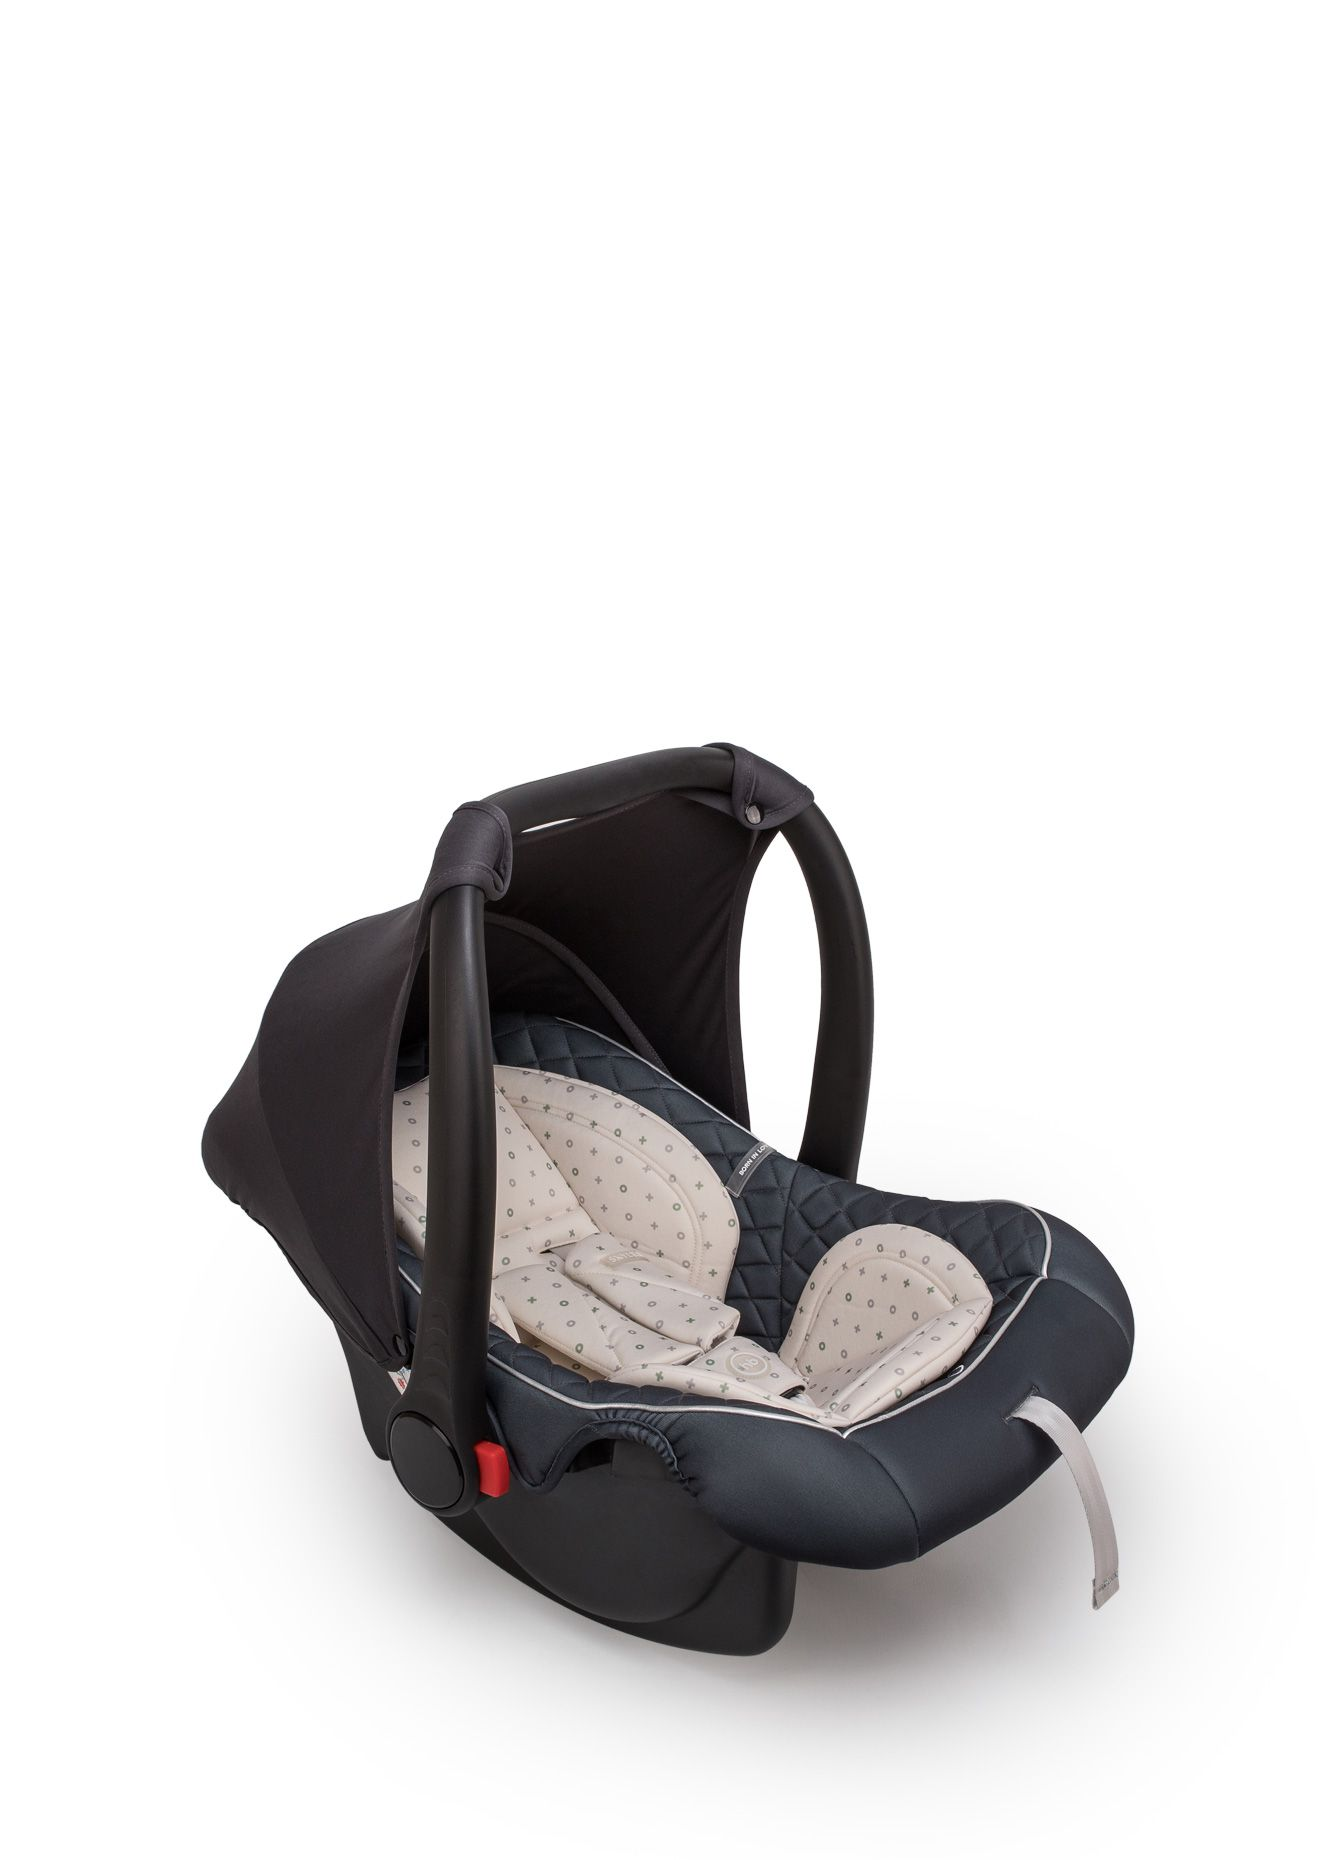 Автокресло Happy Baby SKYLER V2 люлька-переноска Graphite